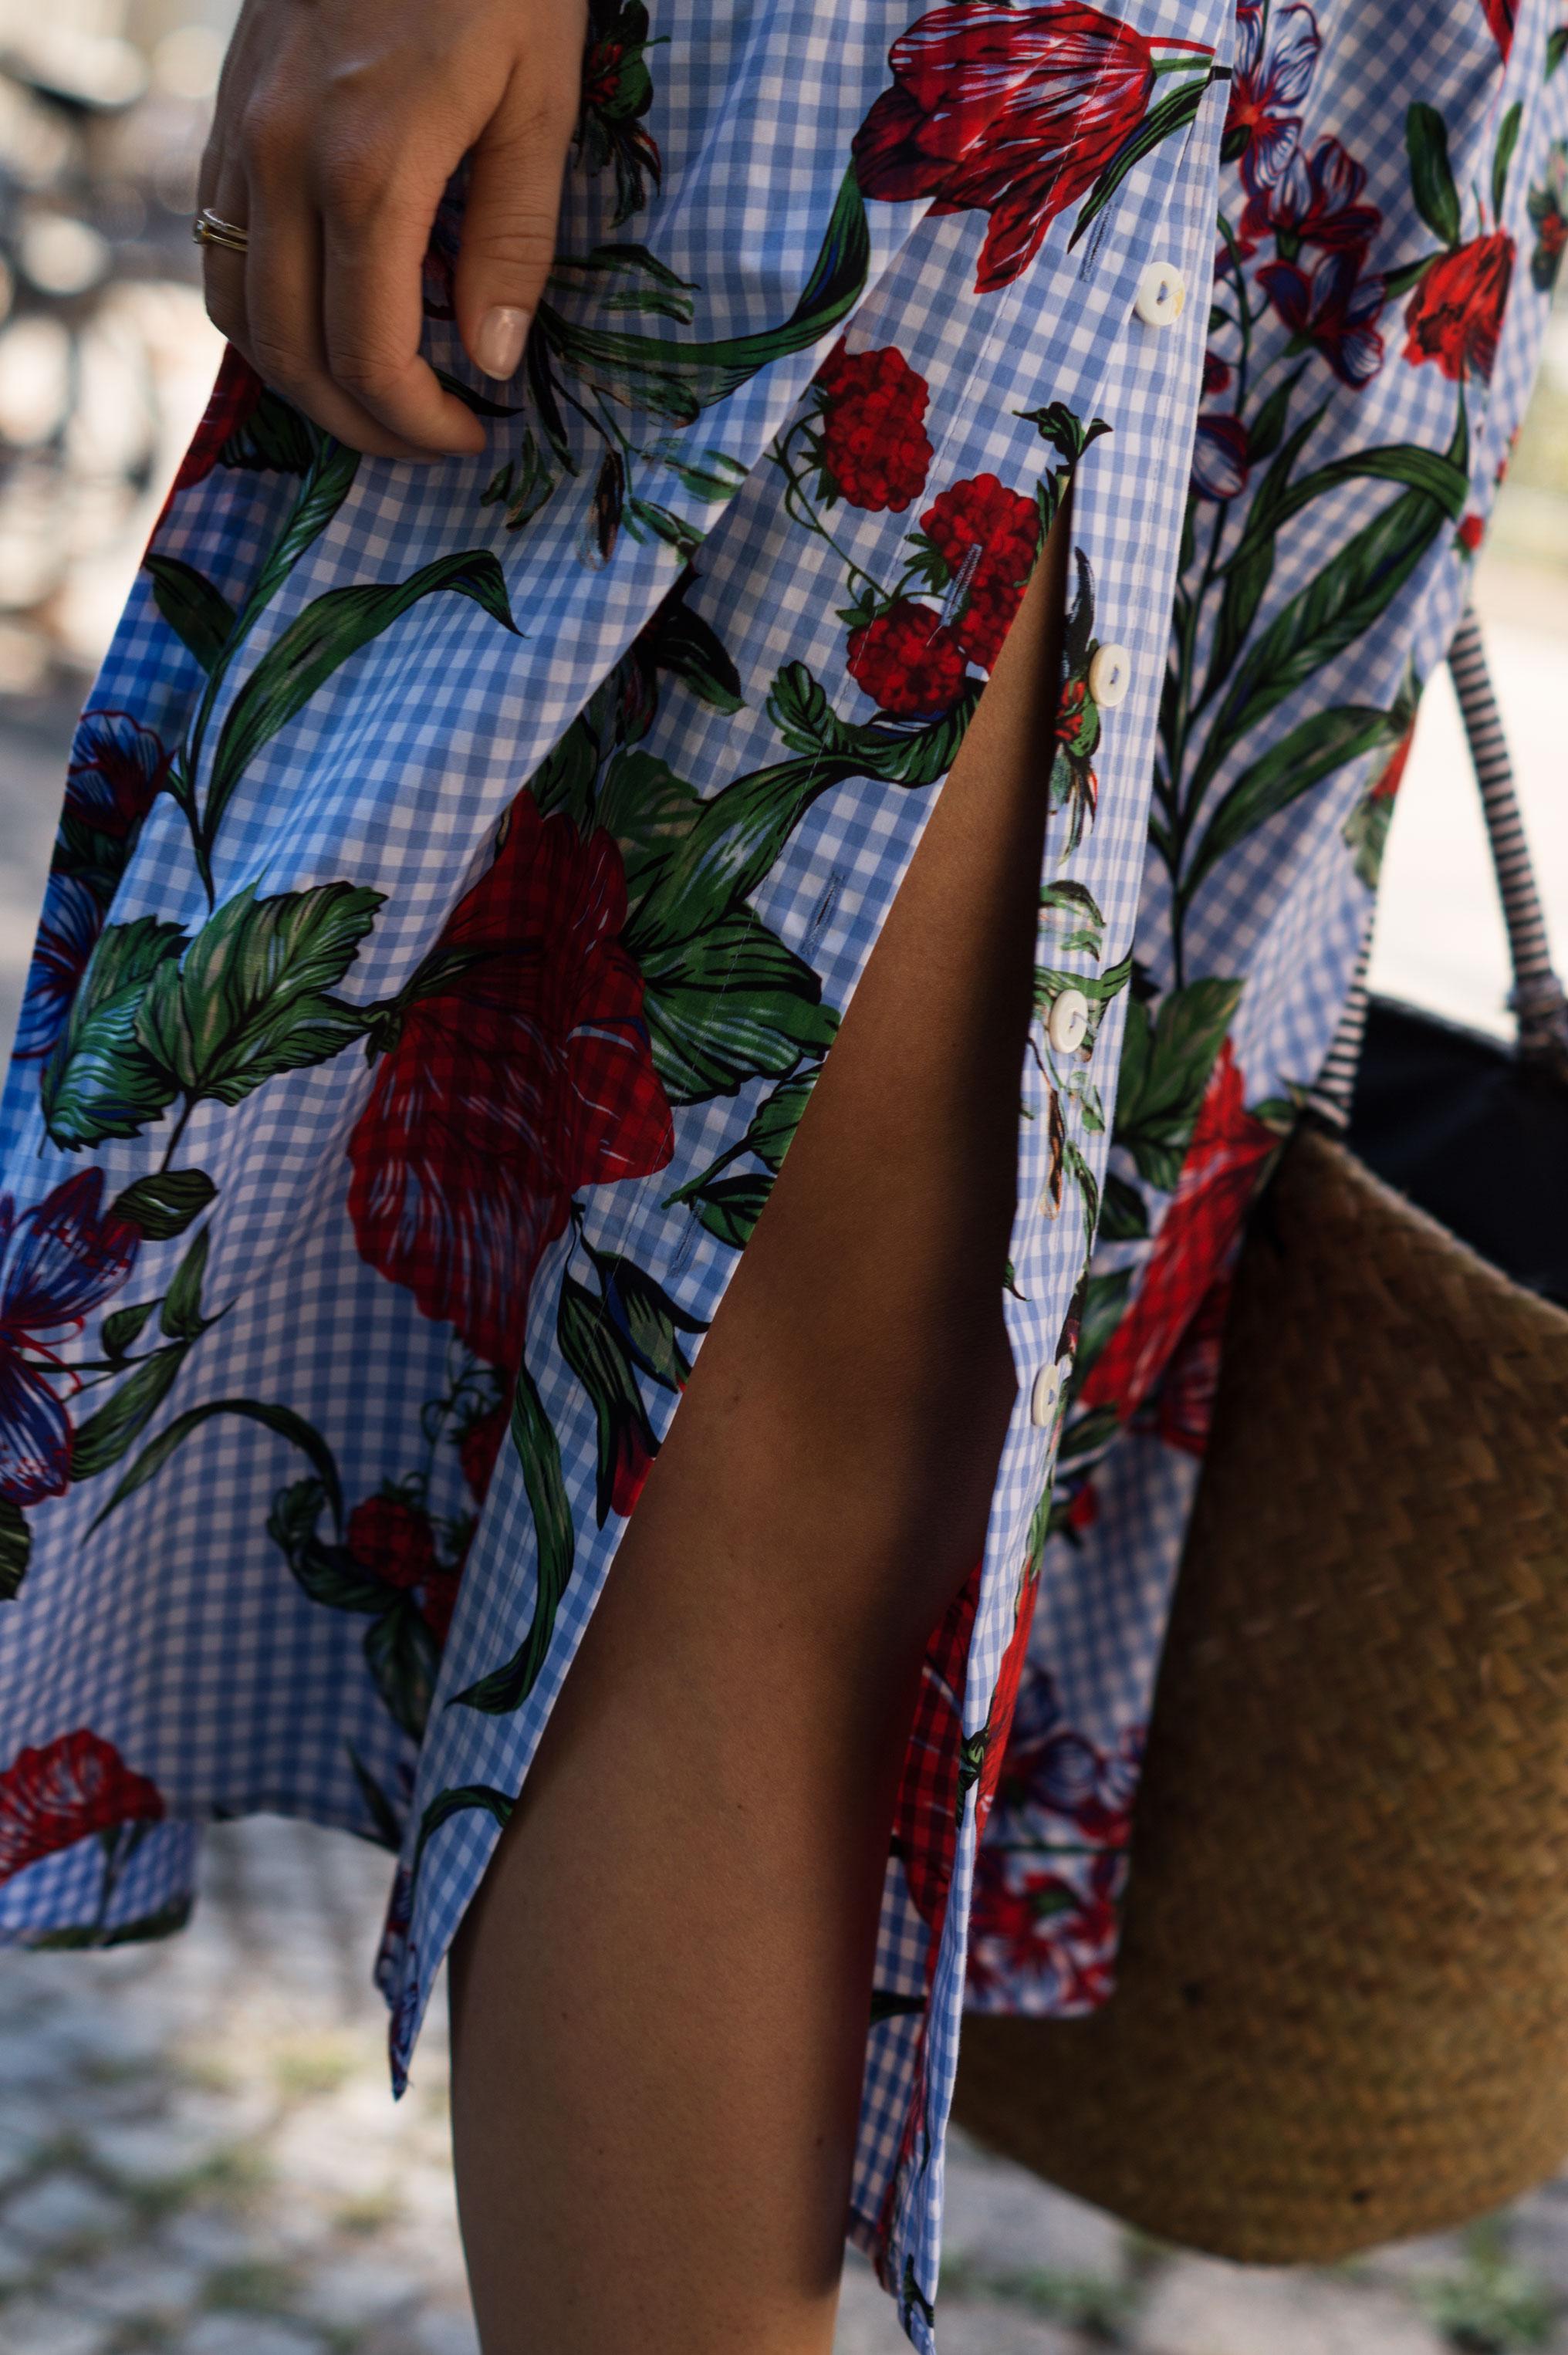 Zara Midi Skirt Ginham Floral Print Blumenmuster karierter Rock Print Shirt Manfield Mules Sariety Summer Shopping Look_9